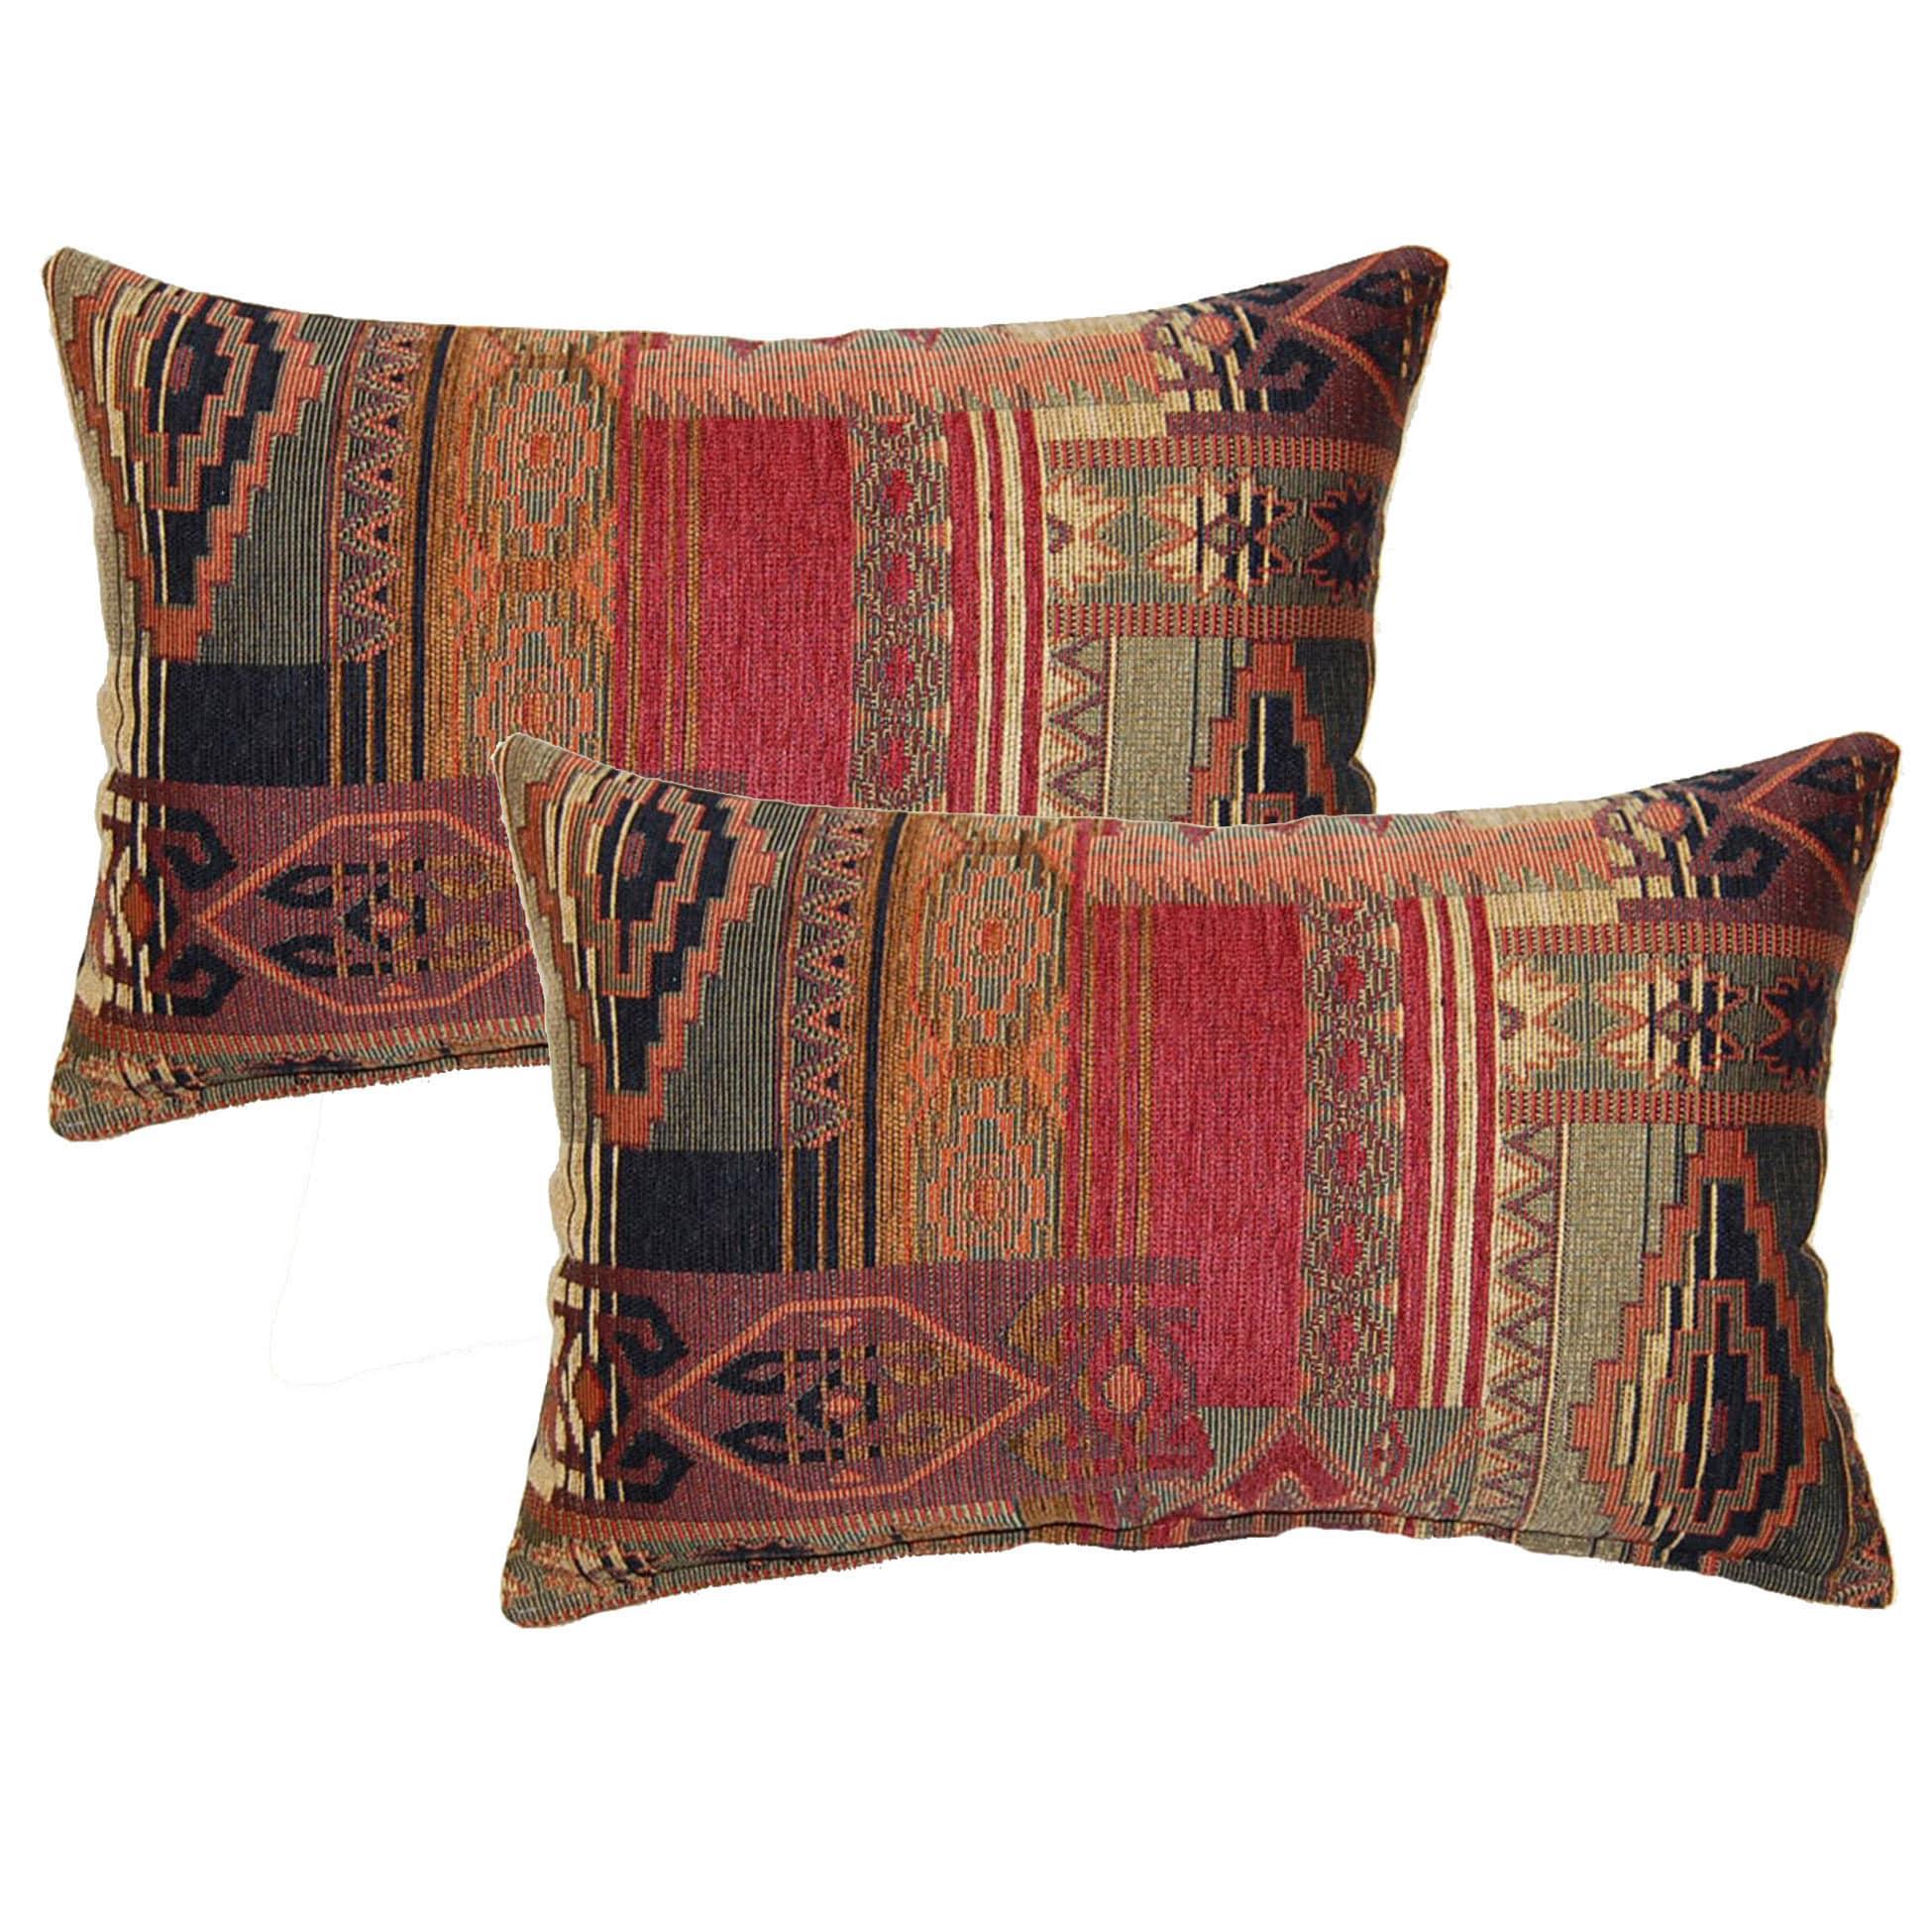 Astounding Sedona Canyon Decorative Throw Pillow Set Of 2 Dailytribune Chair Design For Home Dailytribuneorg